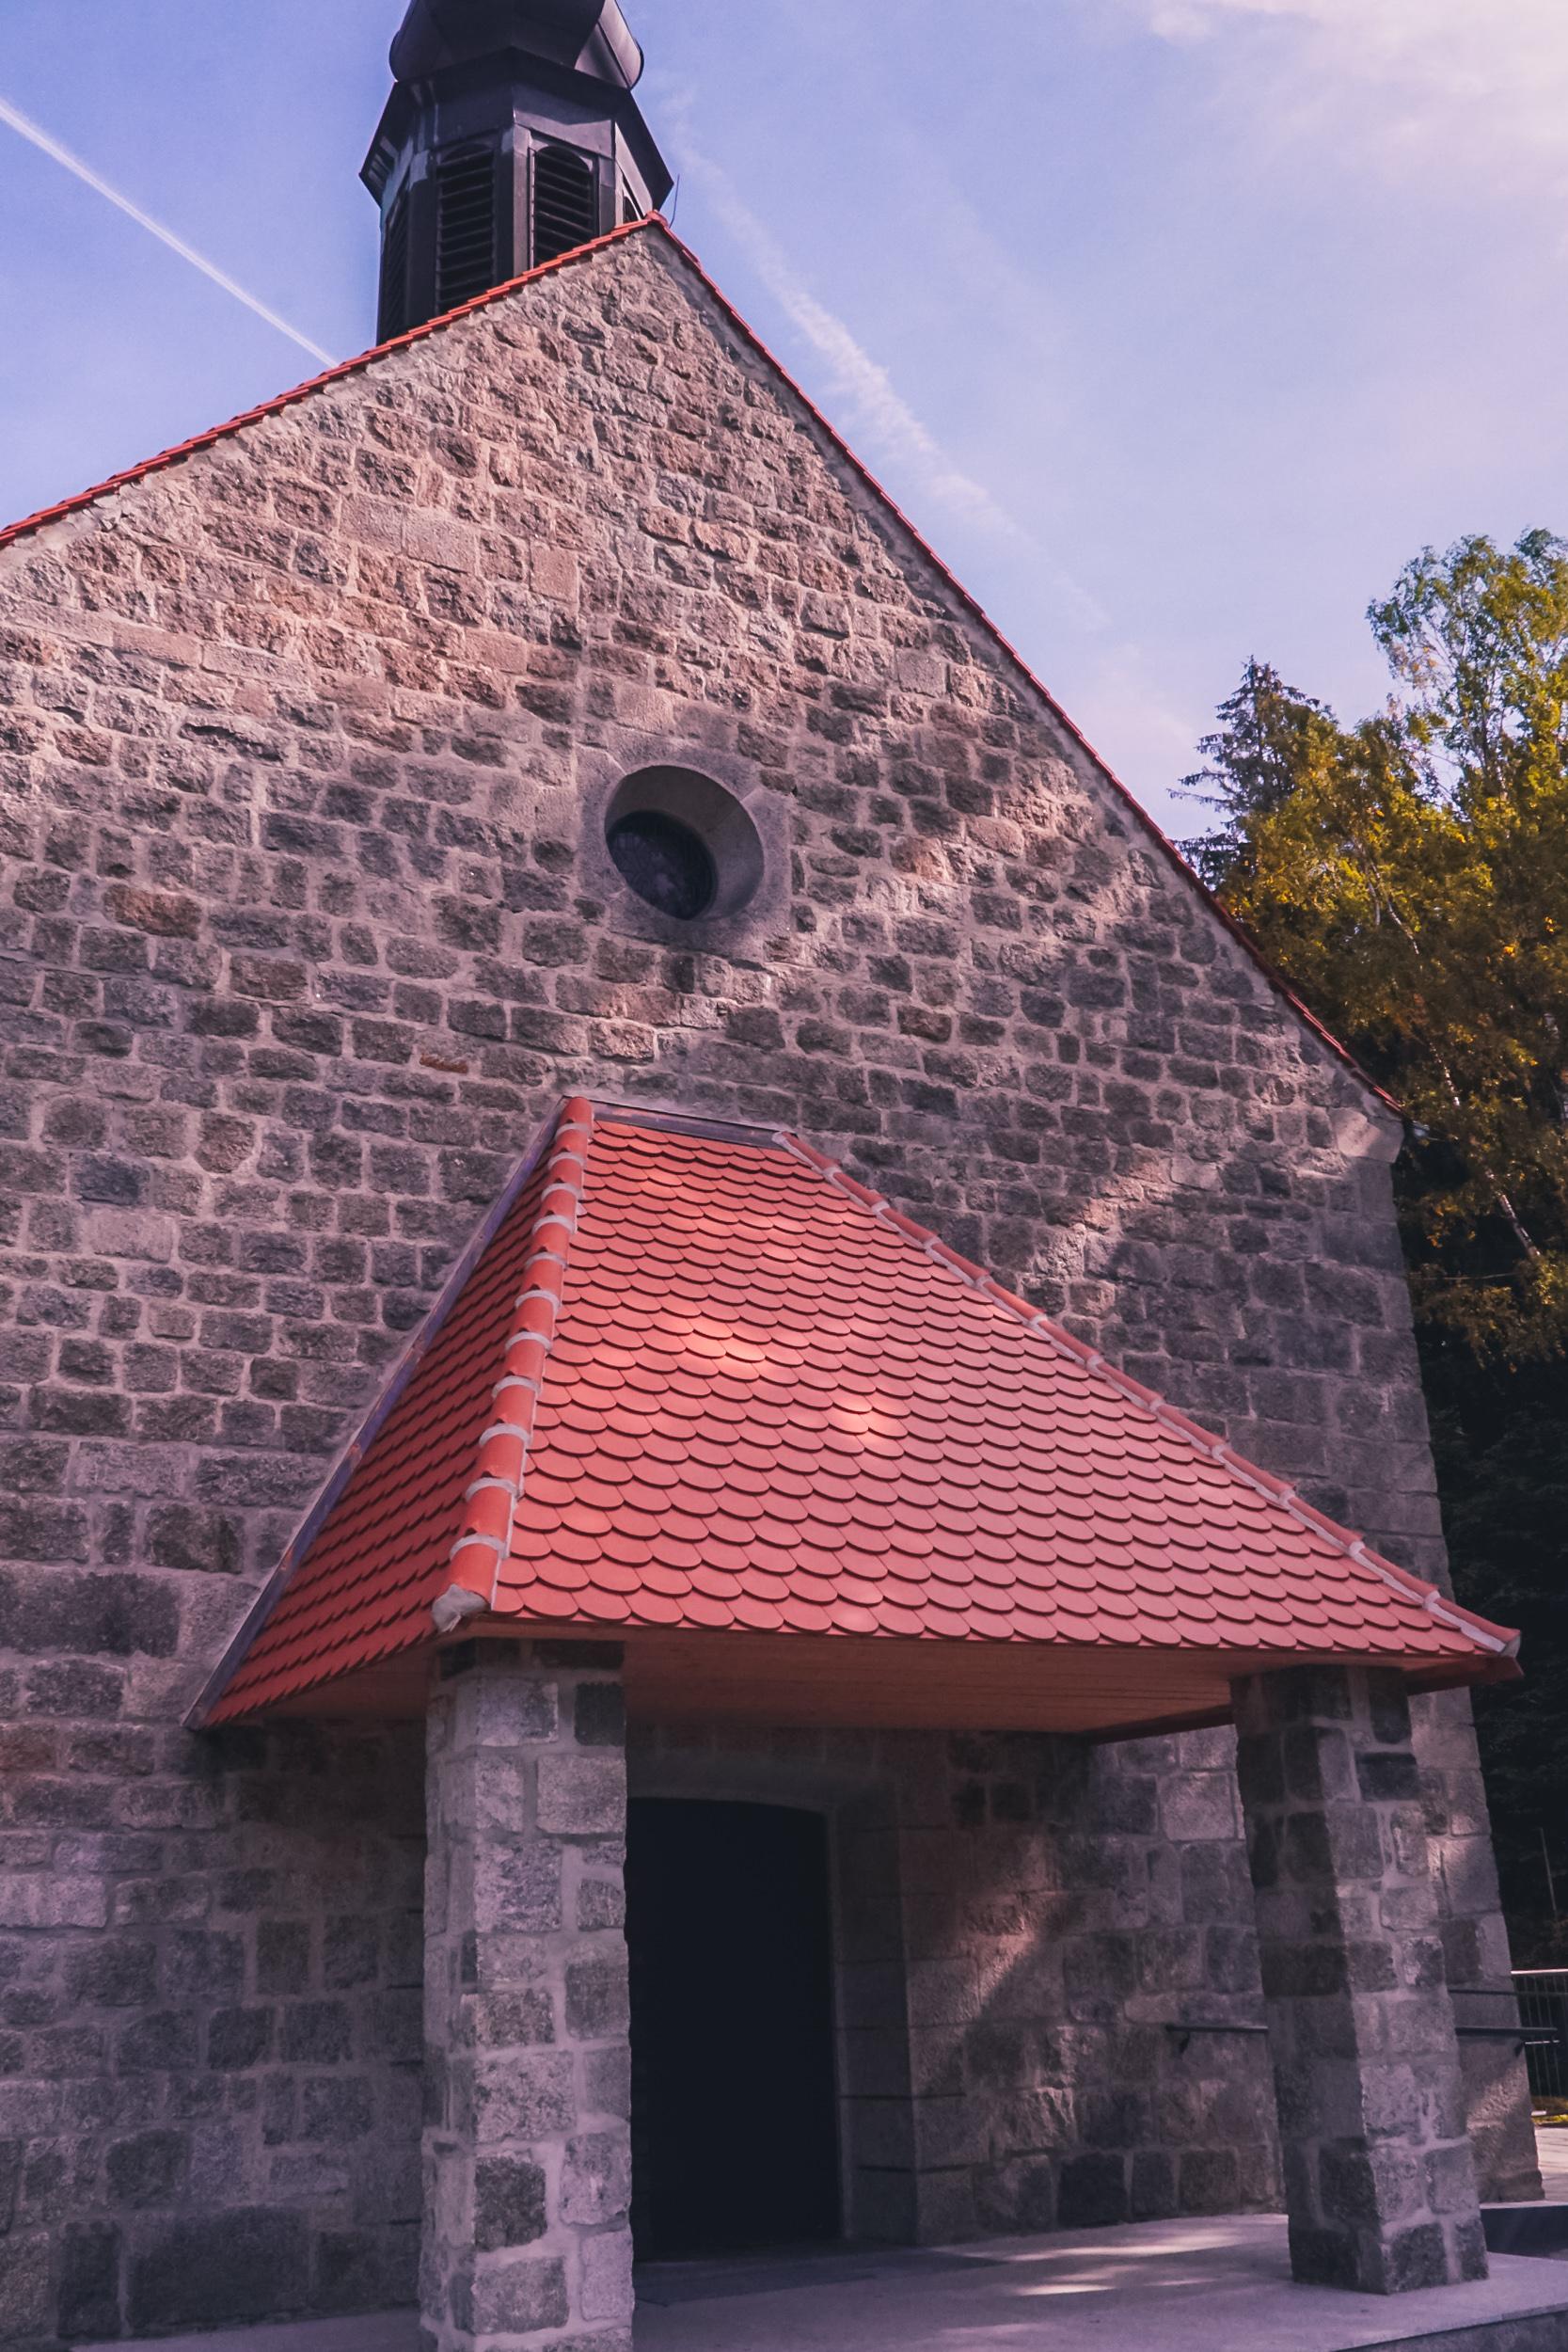 Flossenburg